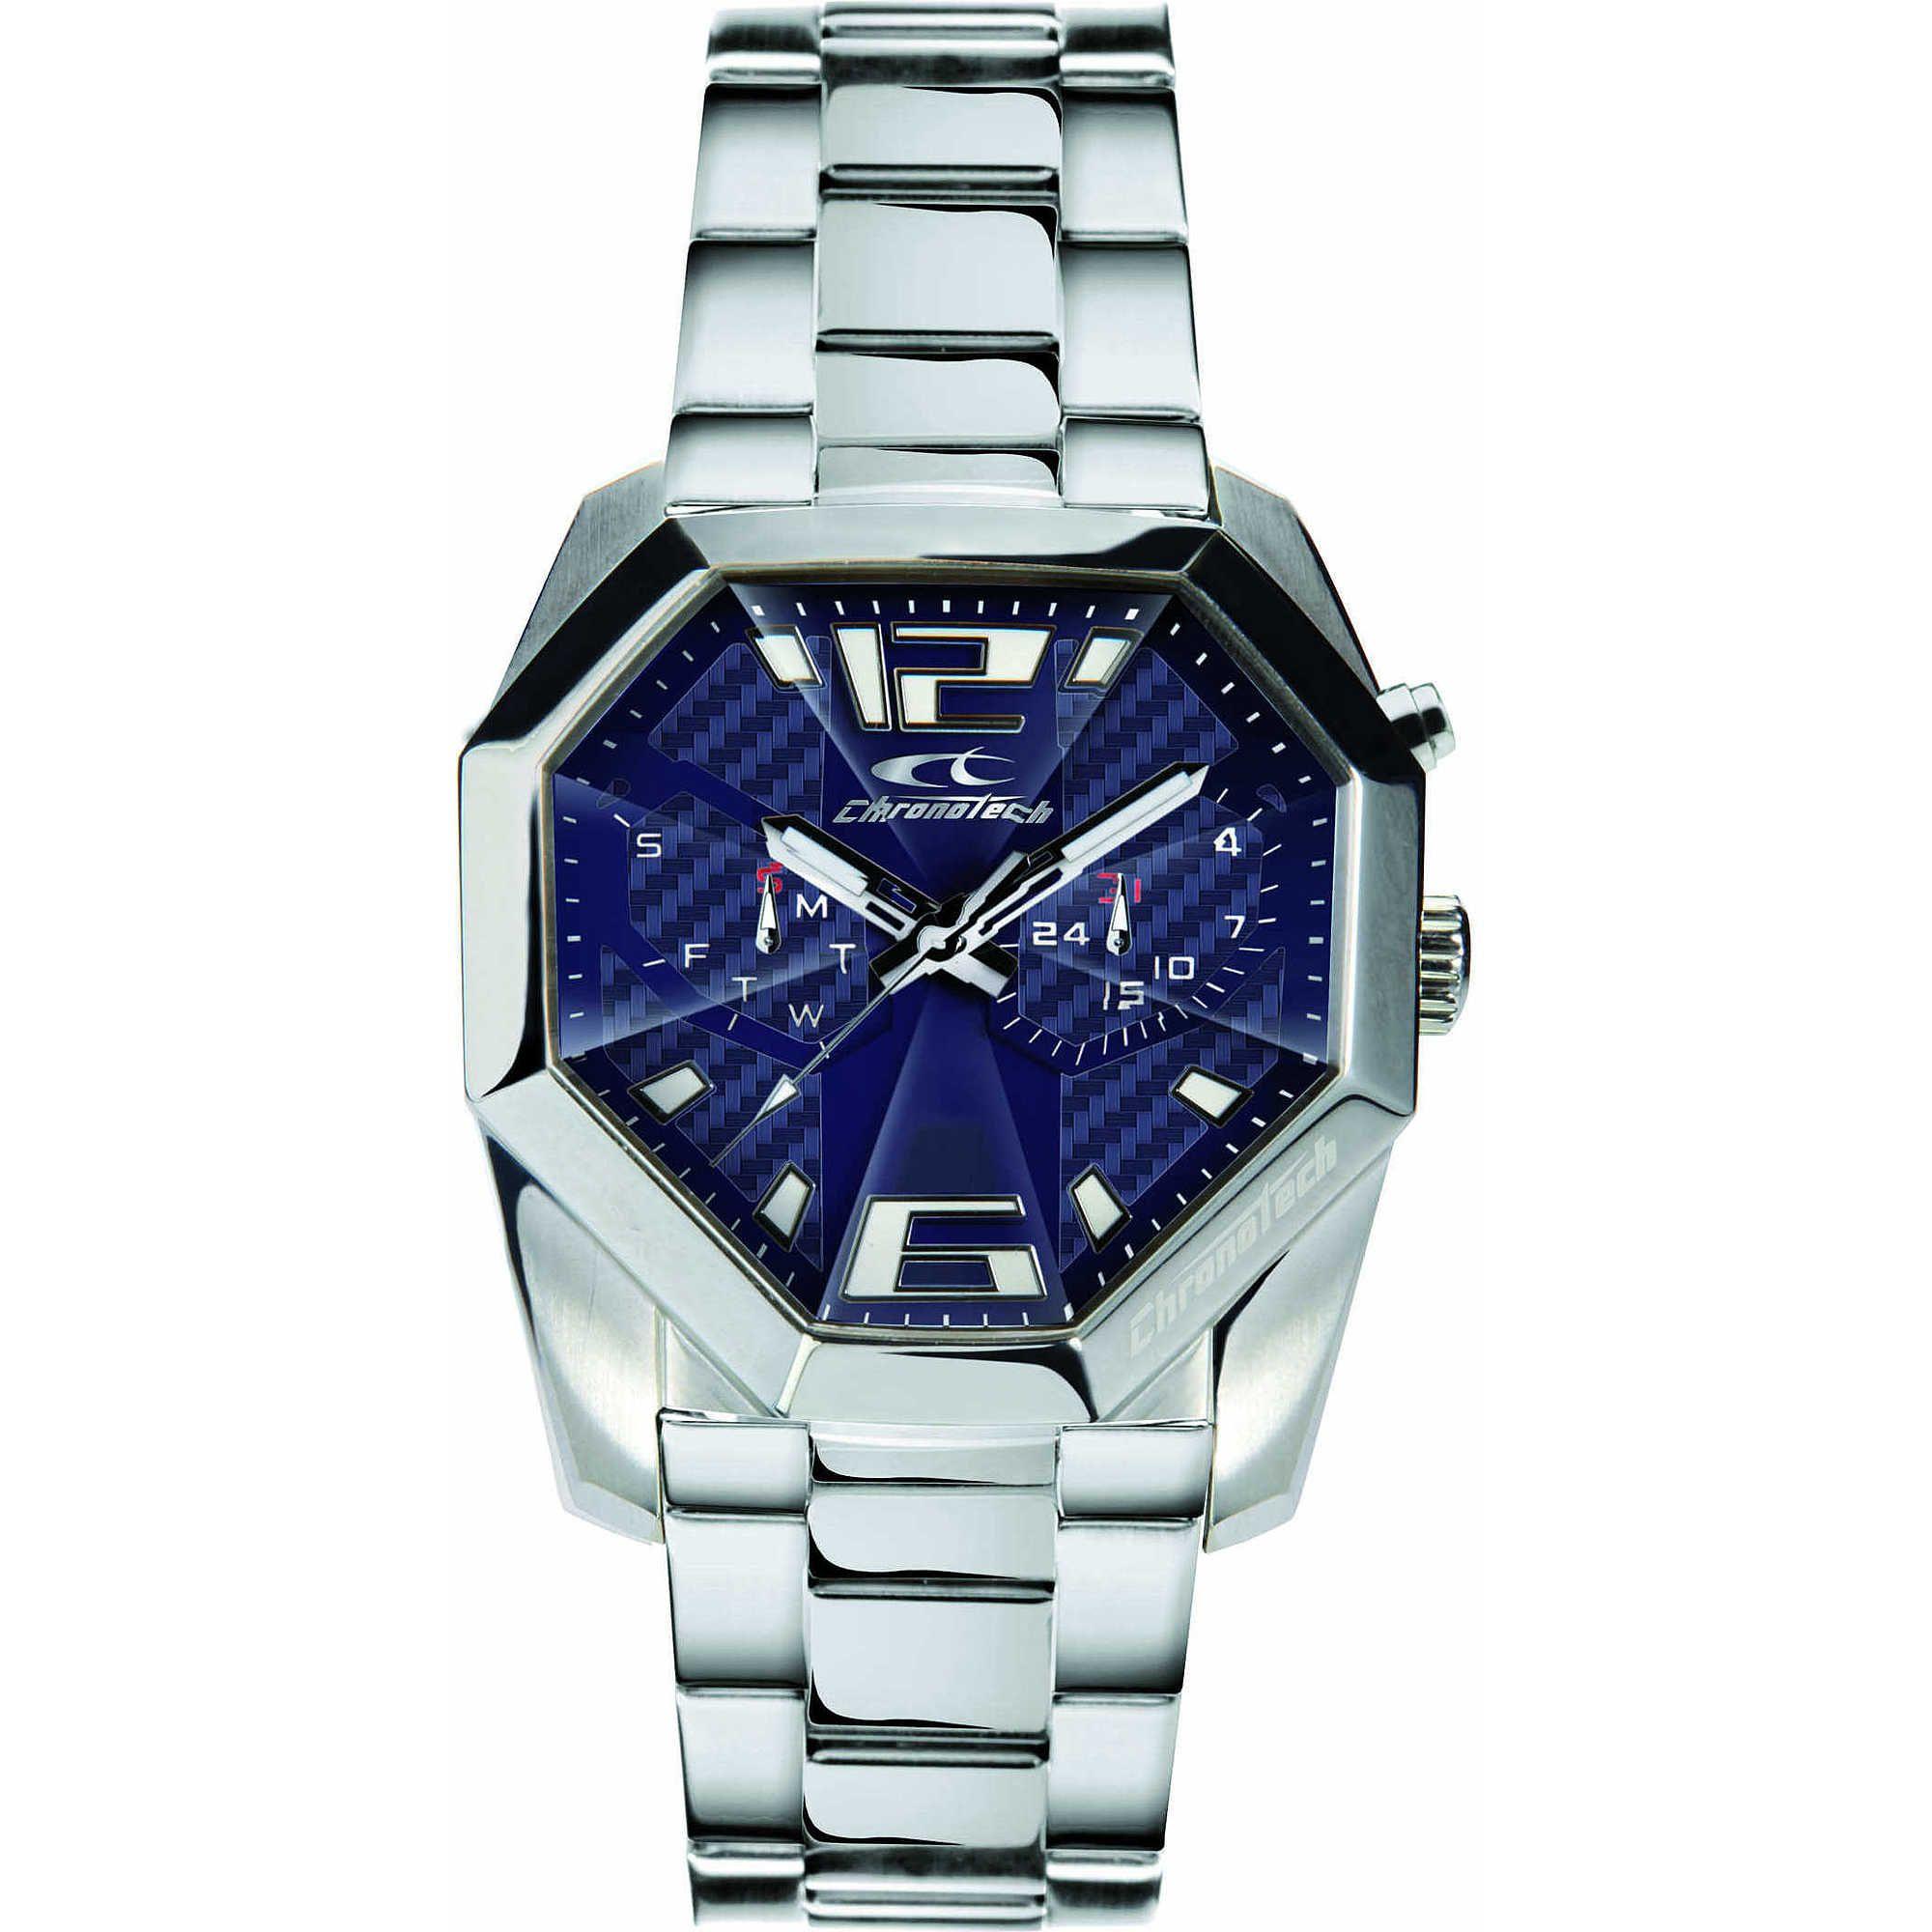 Orologio uomo Chronotech RW0080